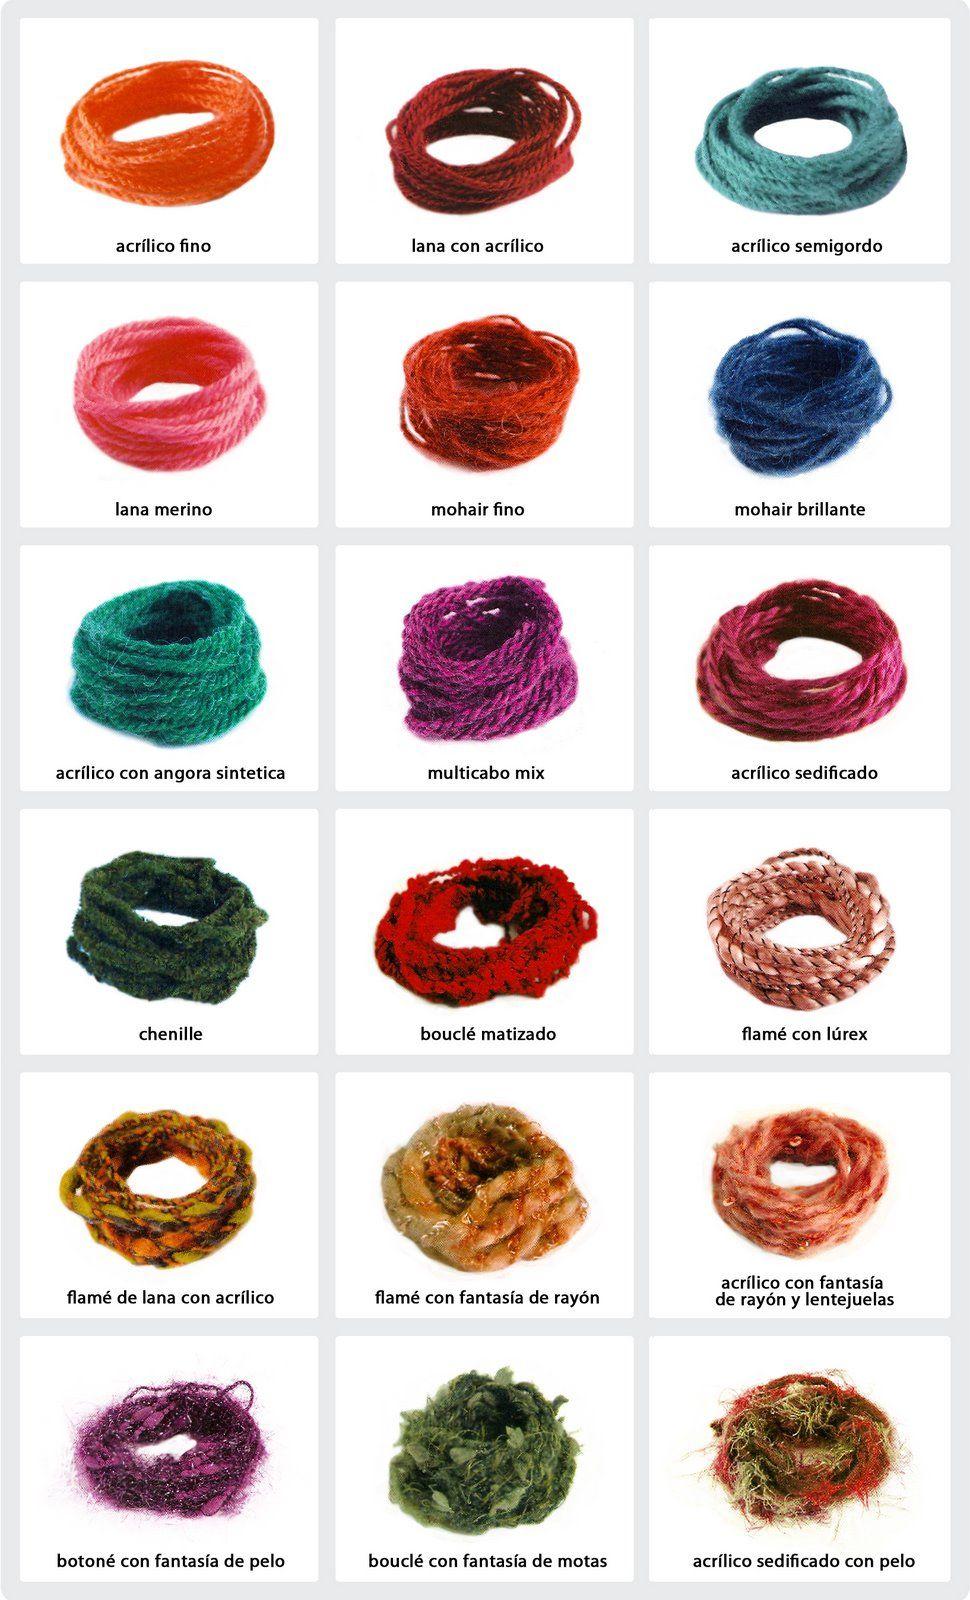 Tipos de hilos para crochet | Crochet muestras | Pinterest